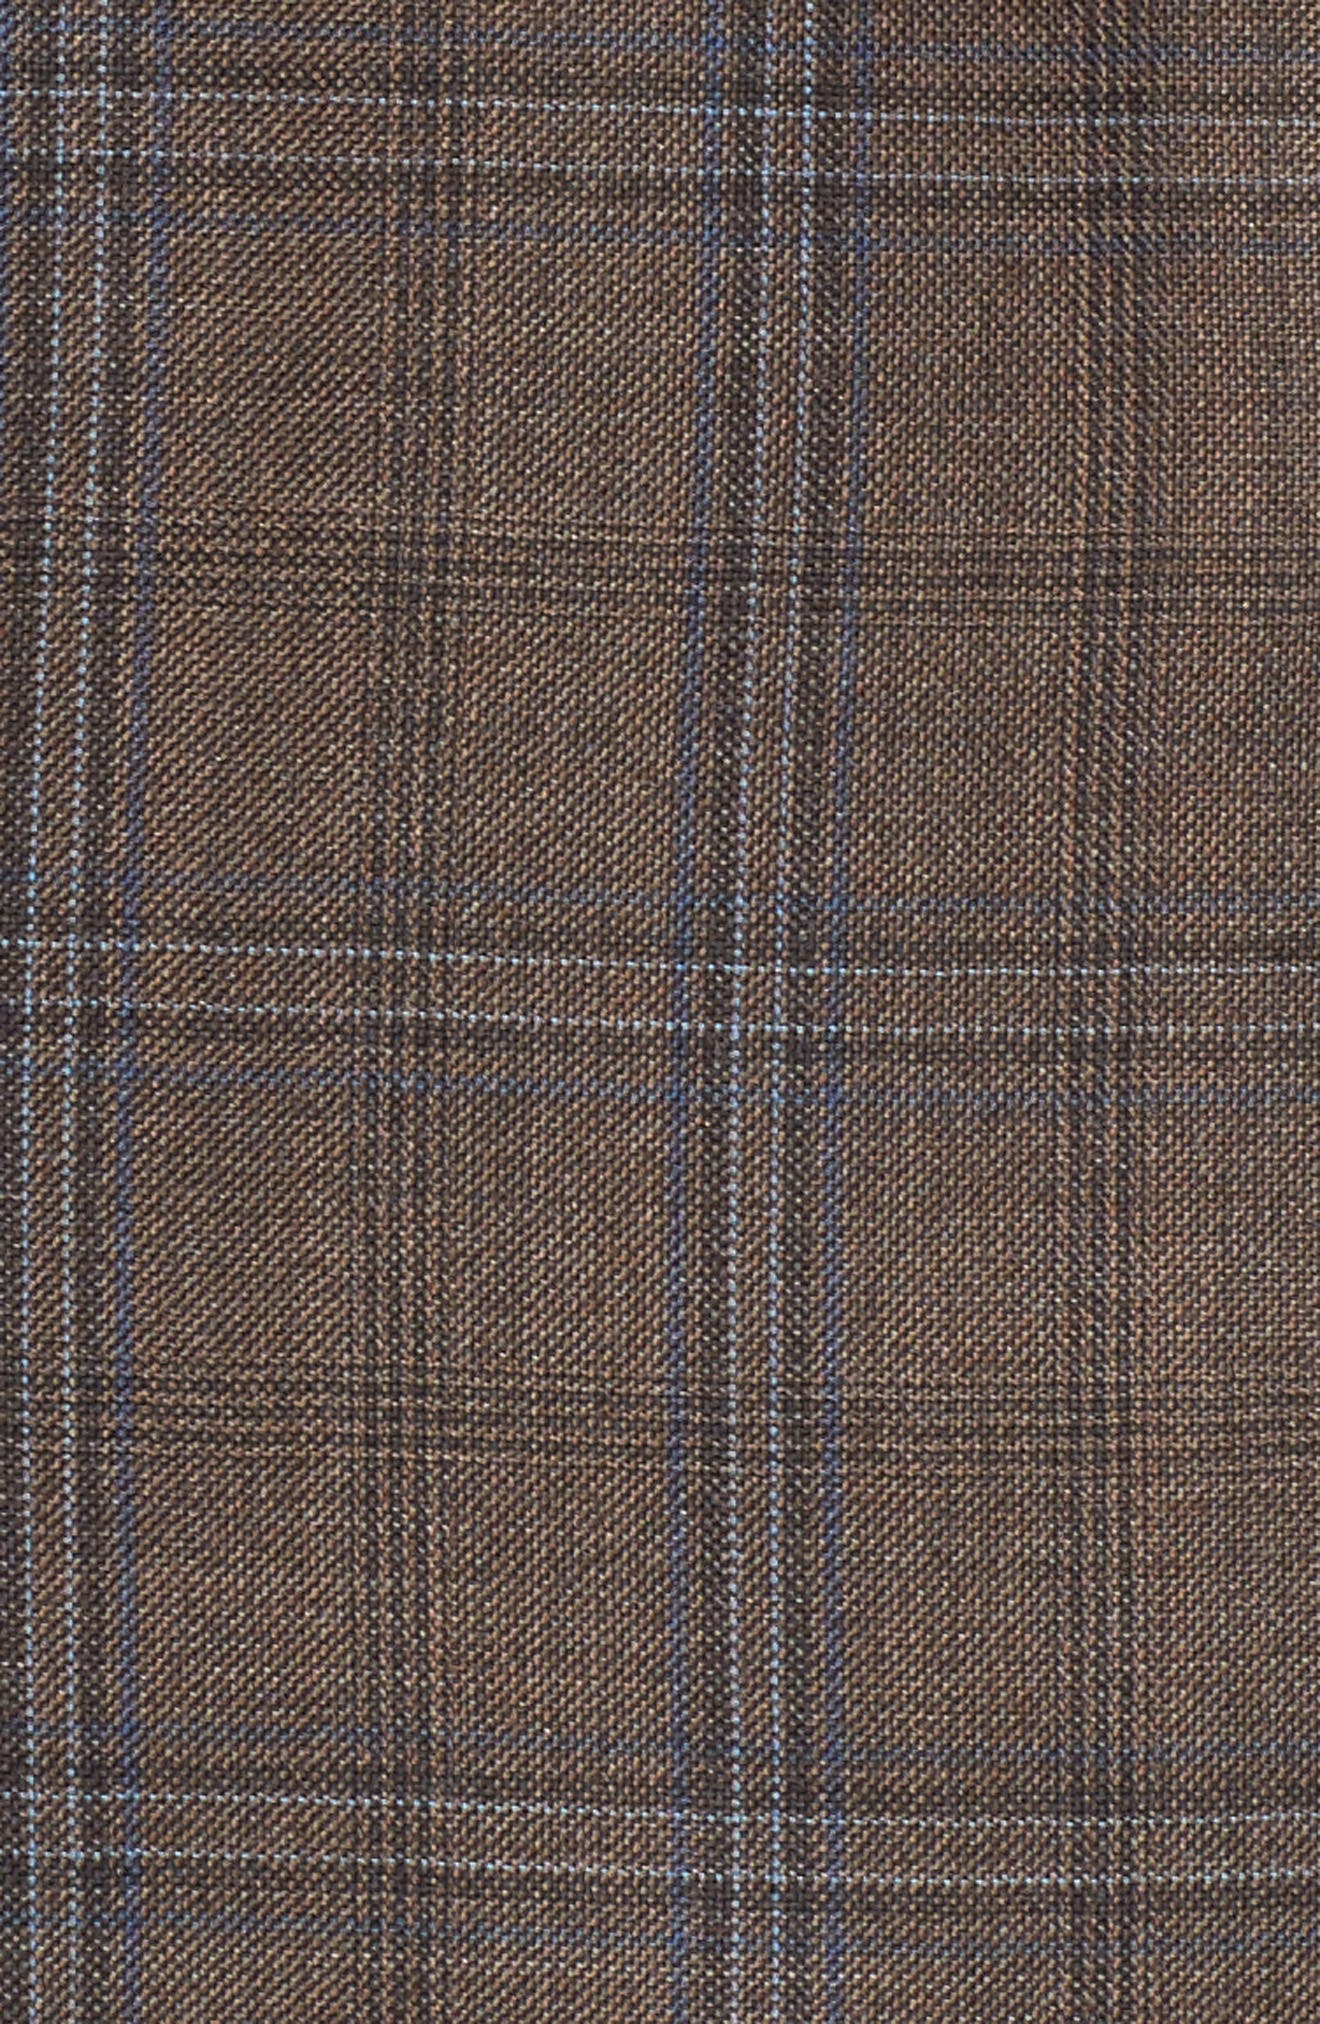 Classic Fit Plaid Wool Sport Coat,                             Alternate thumbnail 5, color,                             Medium Brown